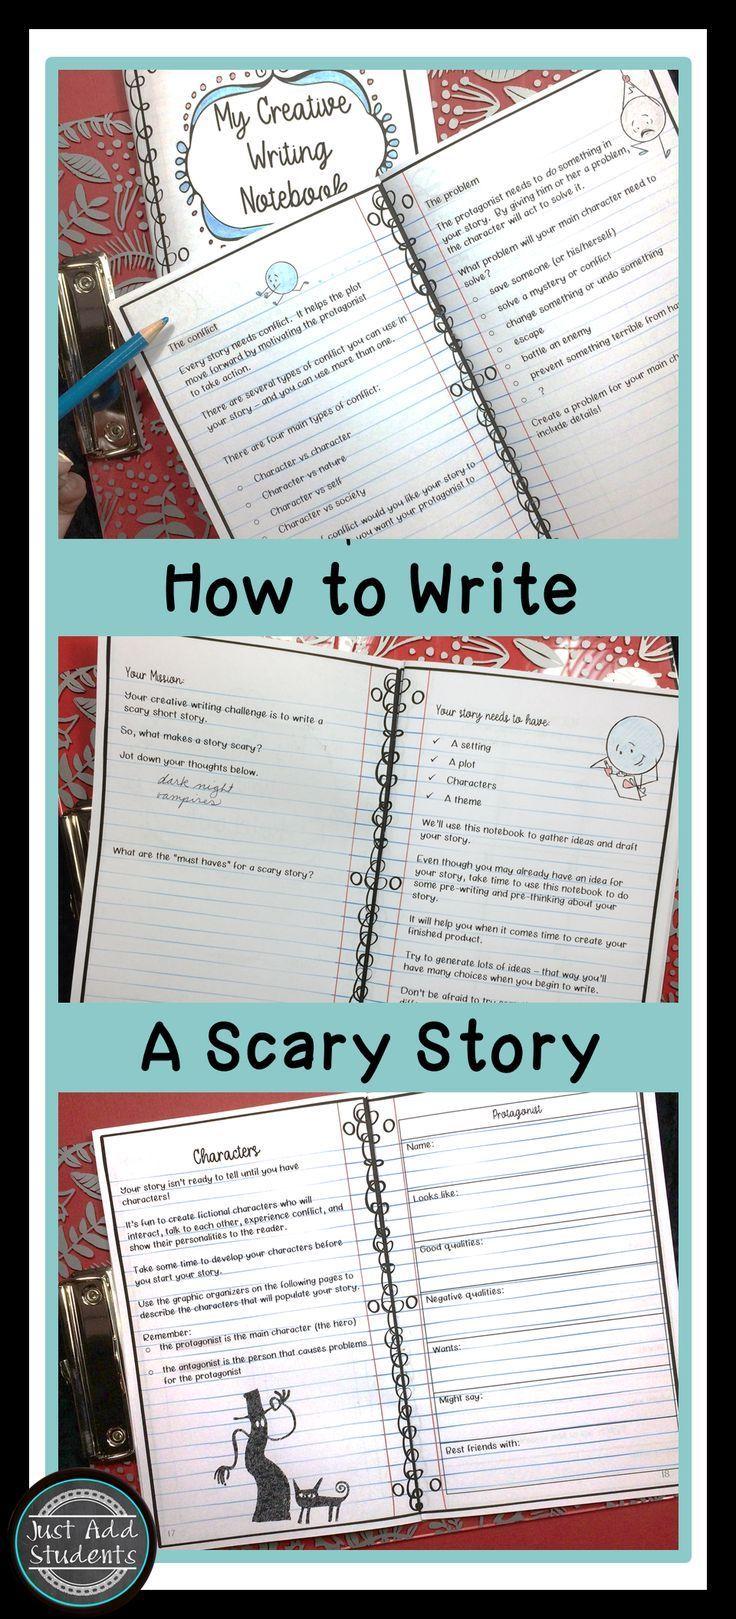 Write A Scary Story Creative Writing Notebook Creative Writing